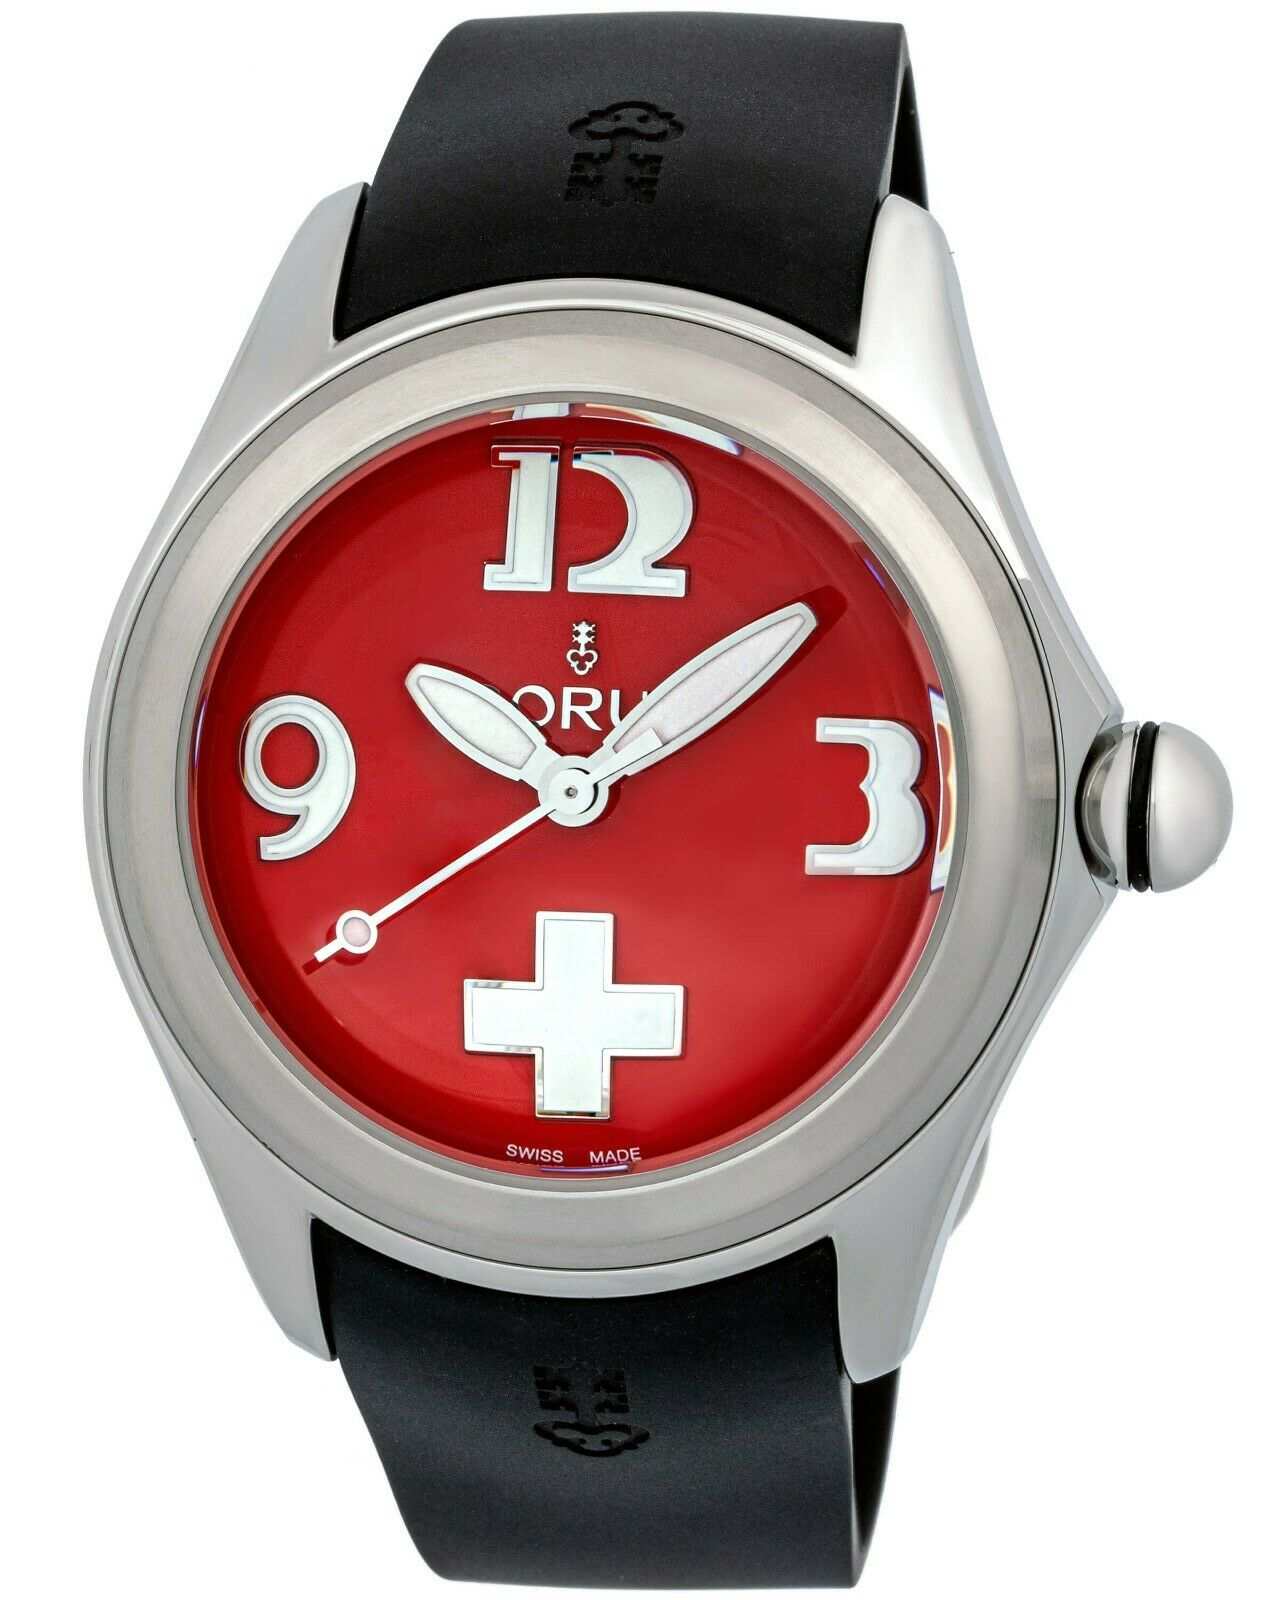 CORUM Men's Bubble Steel Case Red Dial Black Rubber Strap Auto Watch R:$4,100.00 - watch picture 1